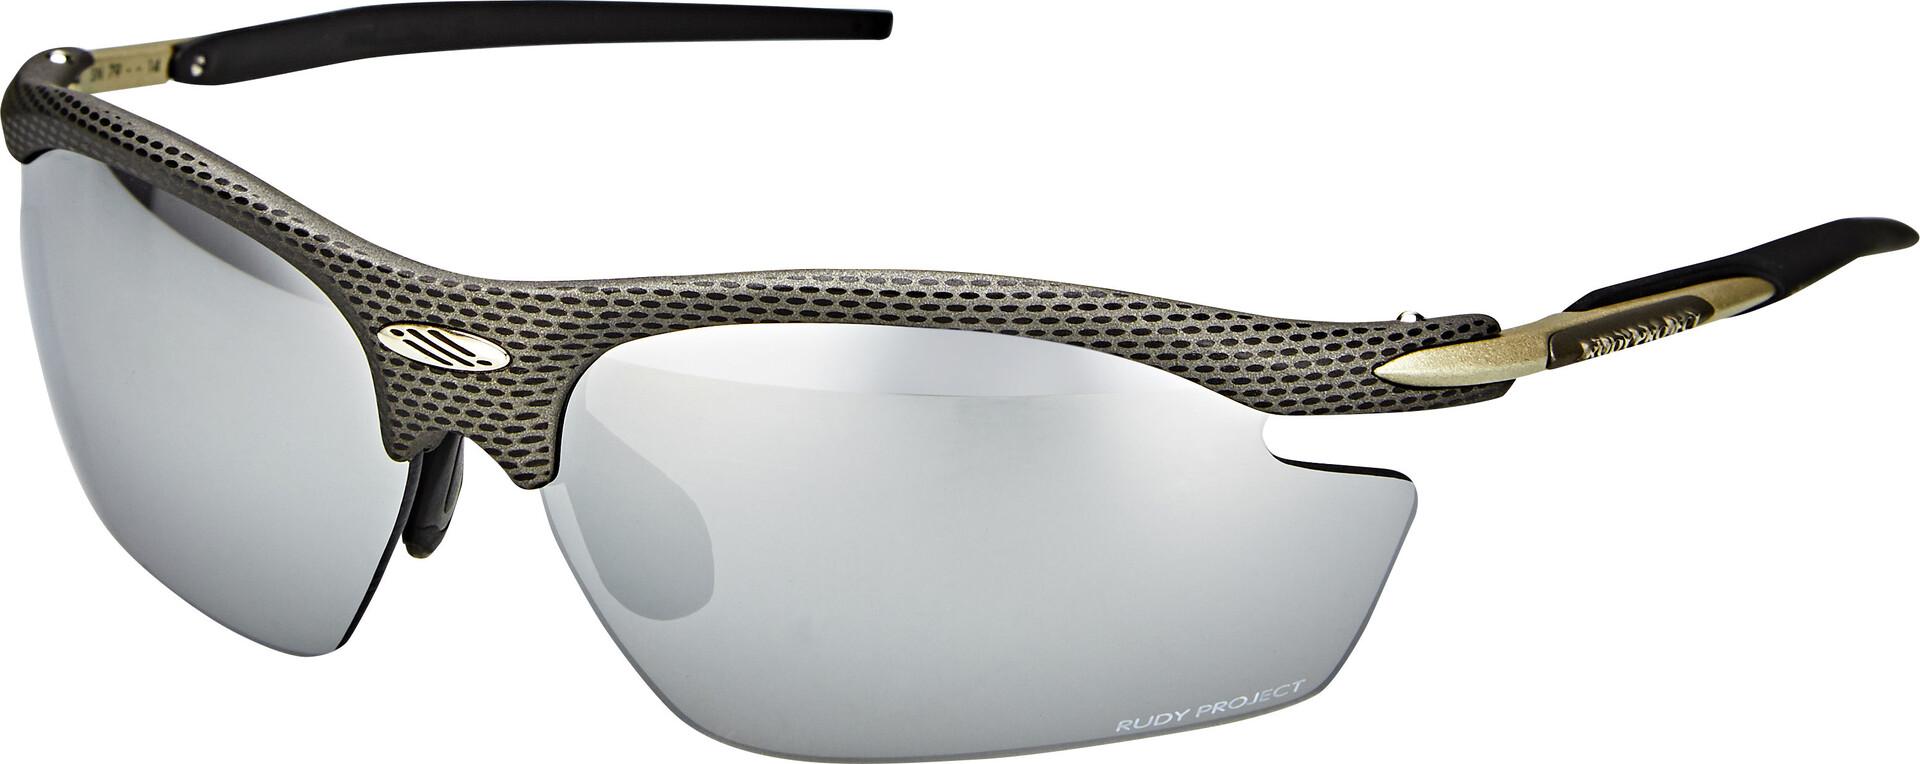 bcd7fe26488 Rudy project rydon bike glasses black jpg 3109x1238 Rudy project glasses  strap